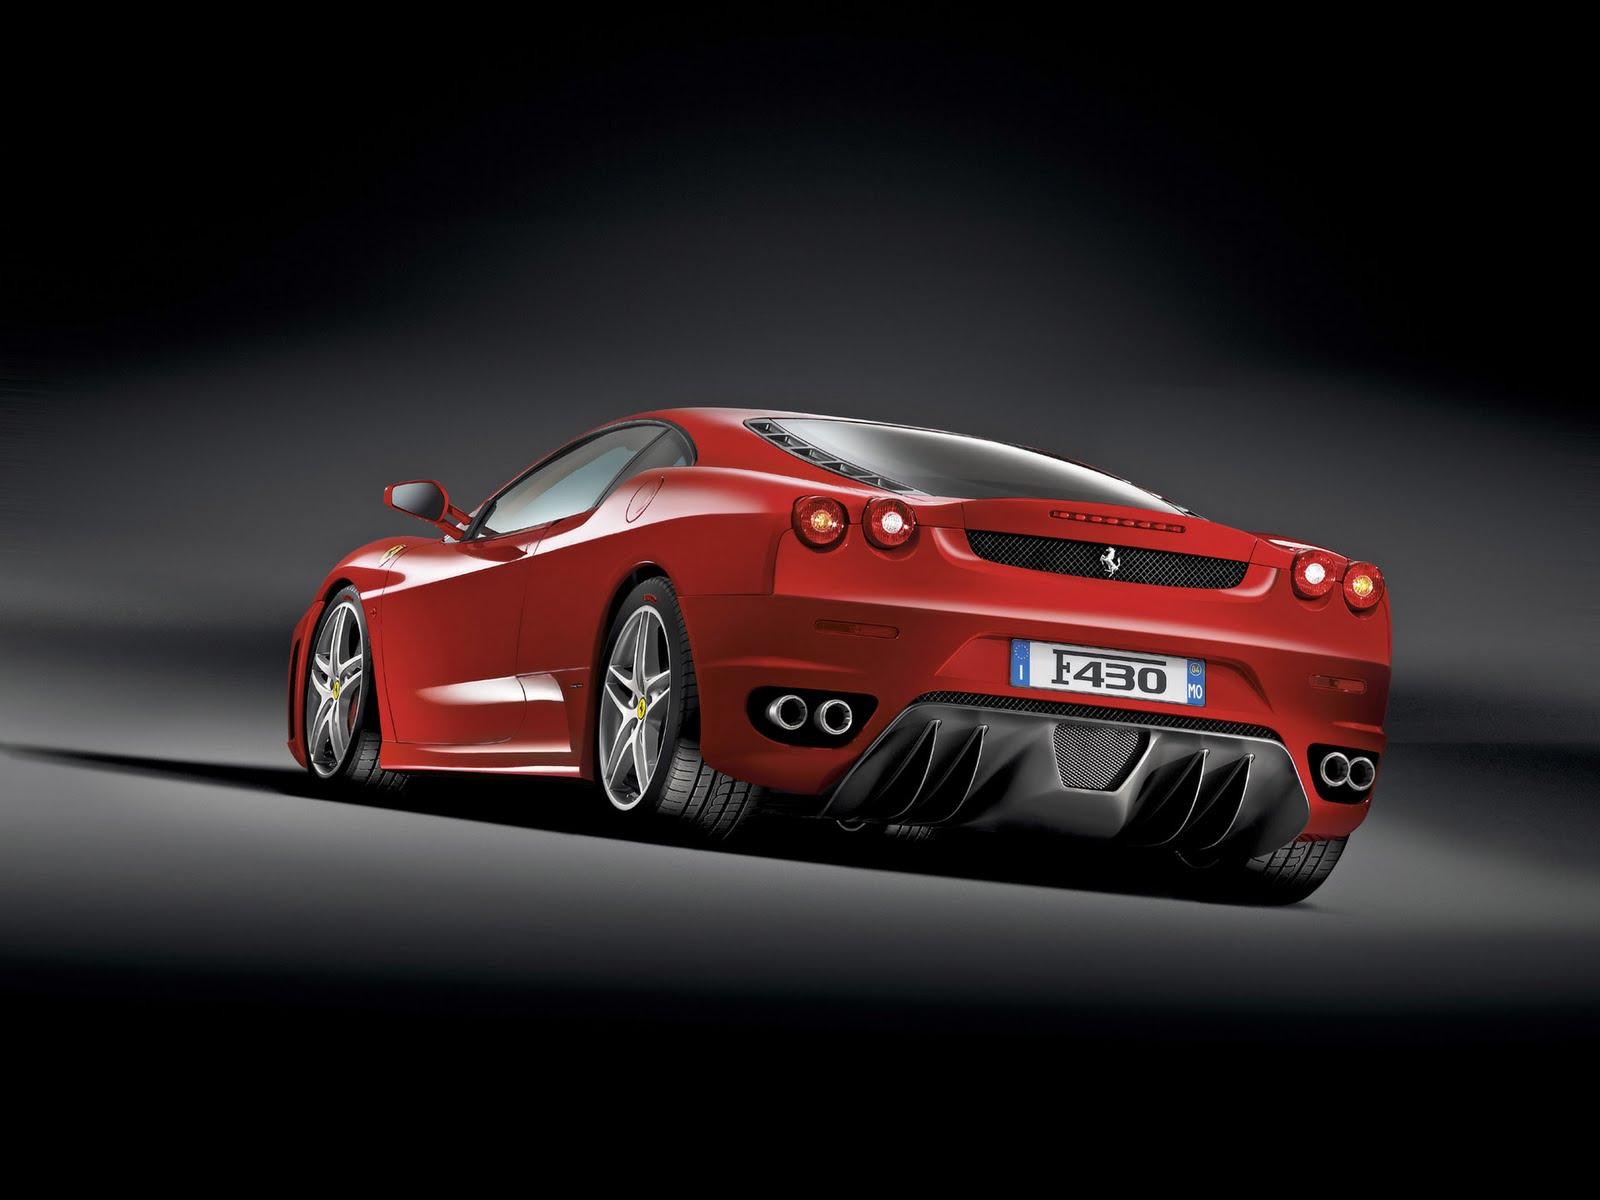 http://2.bp.blogspot.com/-MXX8mOuS46o/TXx4U4OoLXI/AAAAAAAAAKo/J9QkO3merGU/s1600/Ferrari%252Bwallpapers.jpg